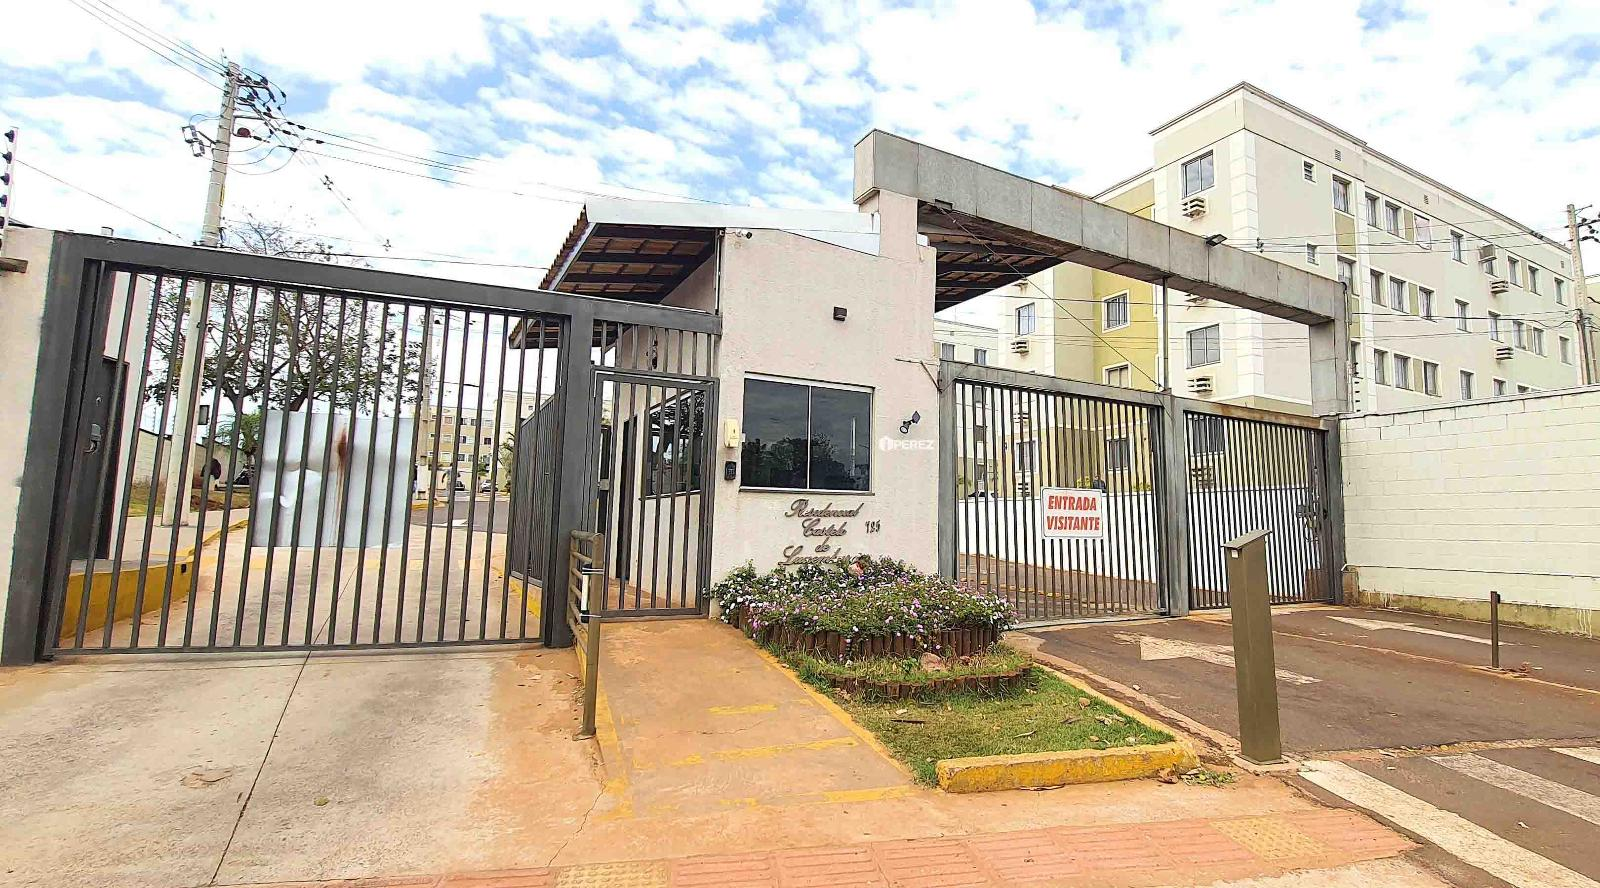 aluguel-campo-grande-ms-apartamento-avenida-senador-antonio-mendes-canale-pioneiros-pioneiros-perez-imoveis